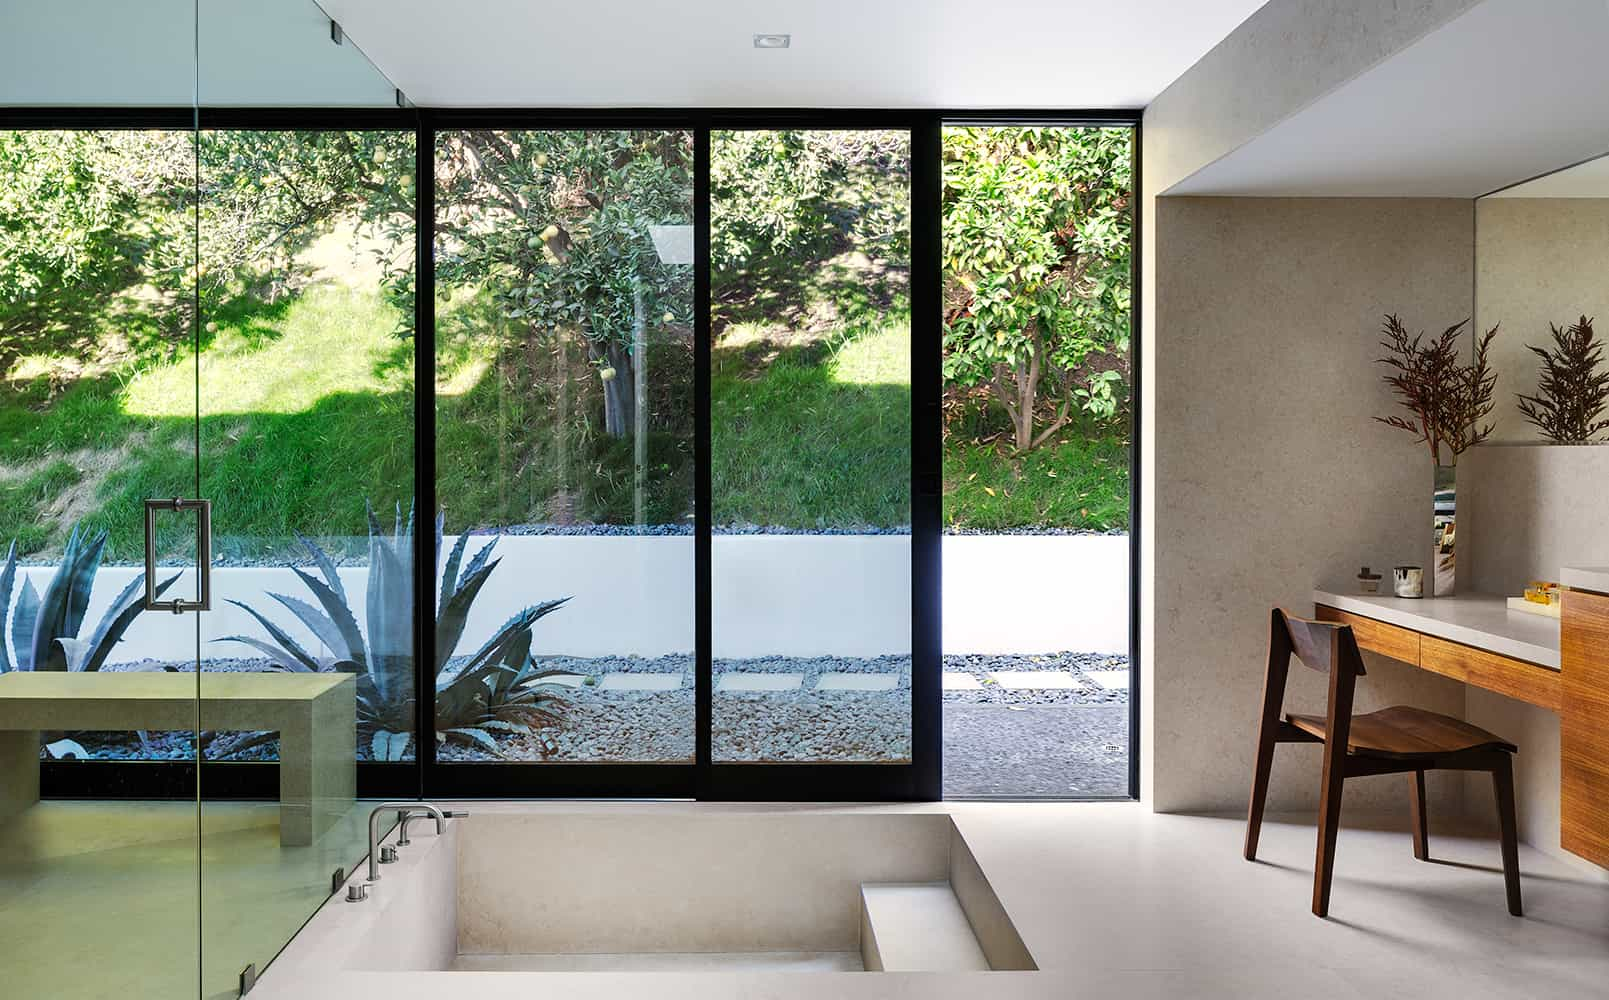 Modern-Home-Renovation-Belzberg Architects-12-1 Kindesign